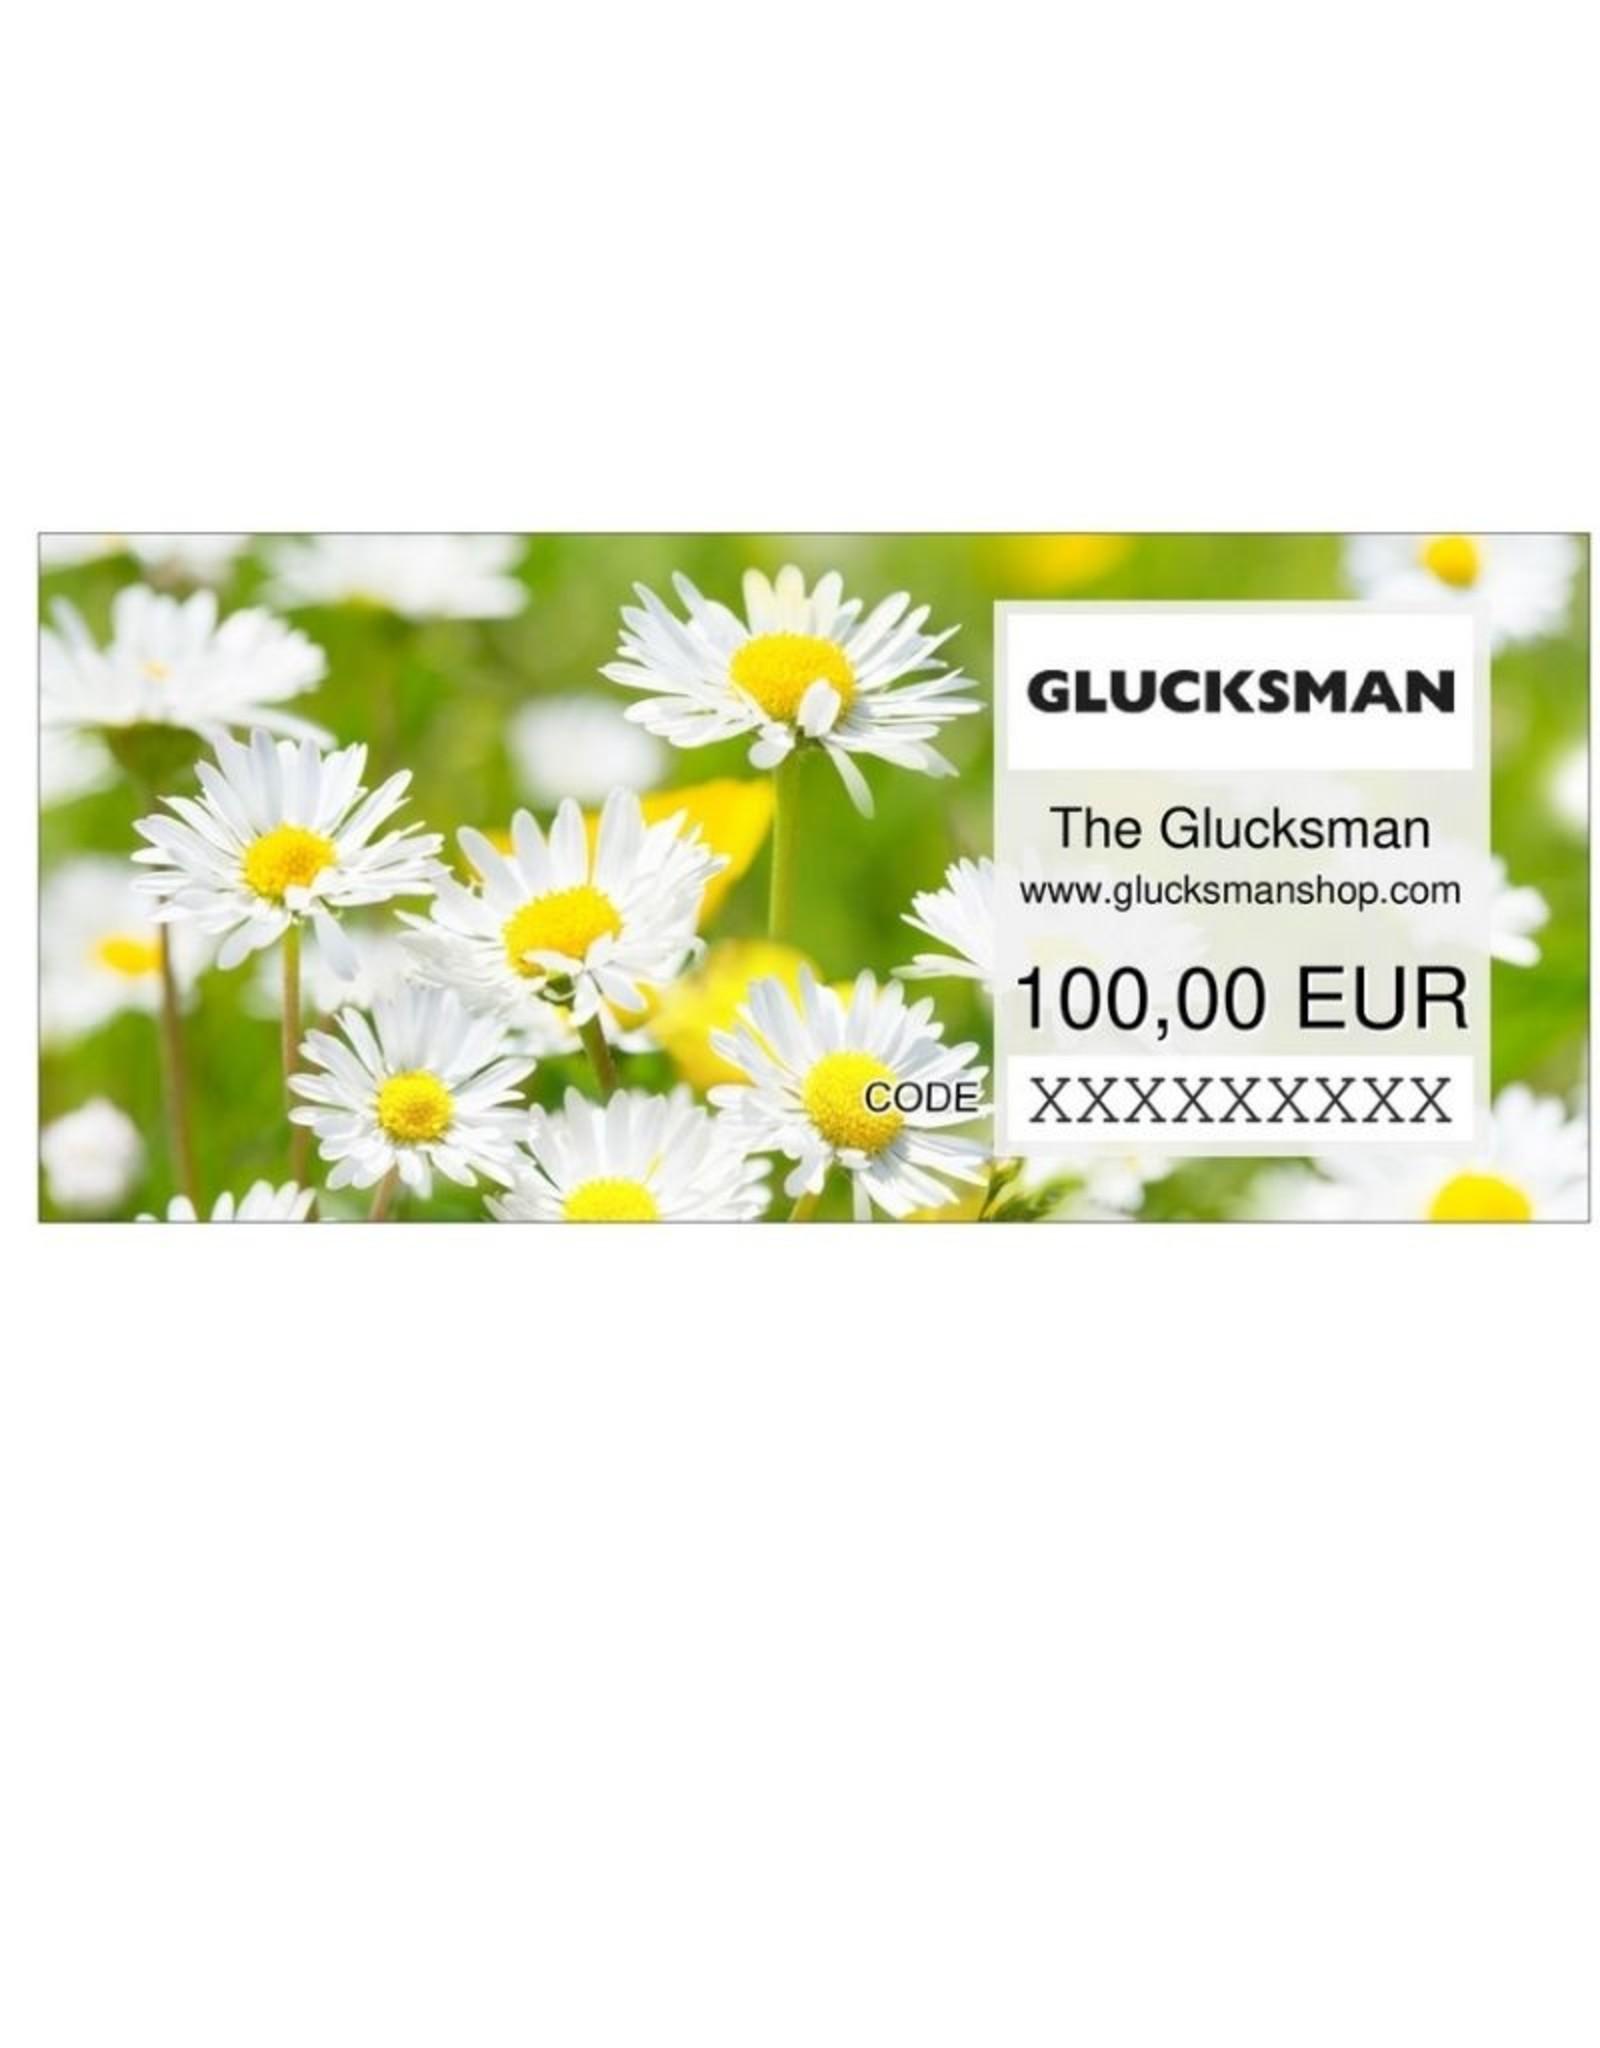 The Glucksman Voucher €100